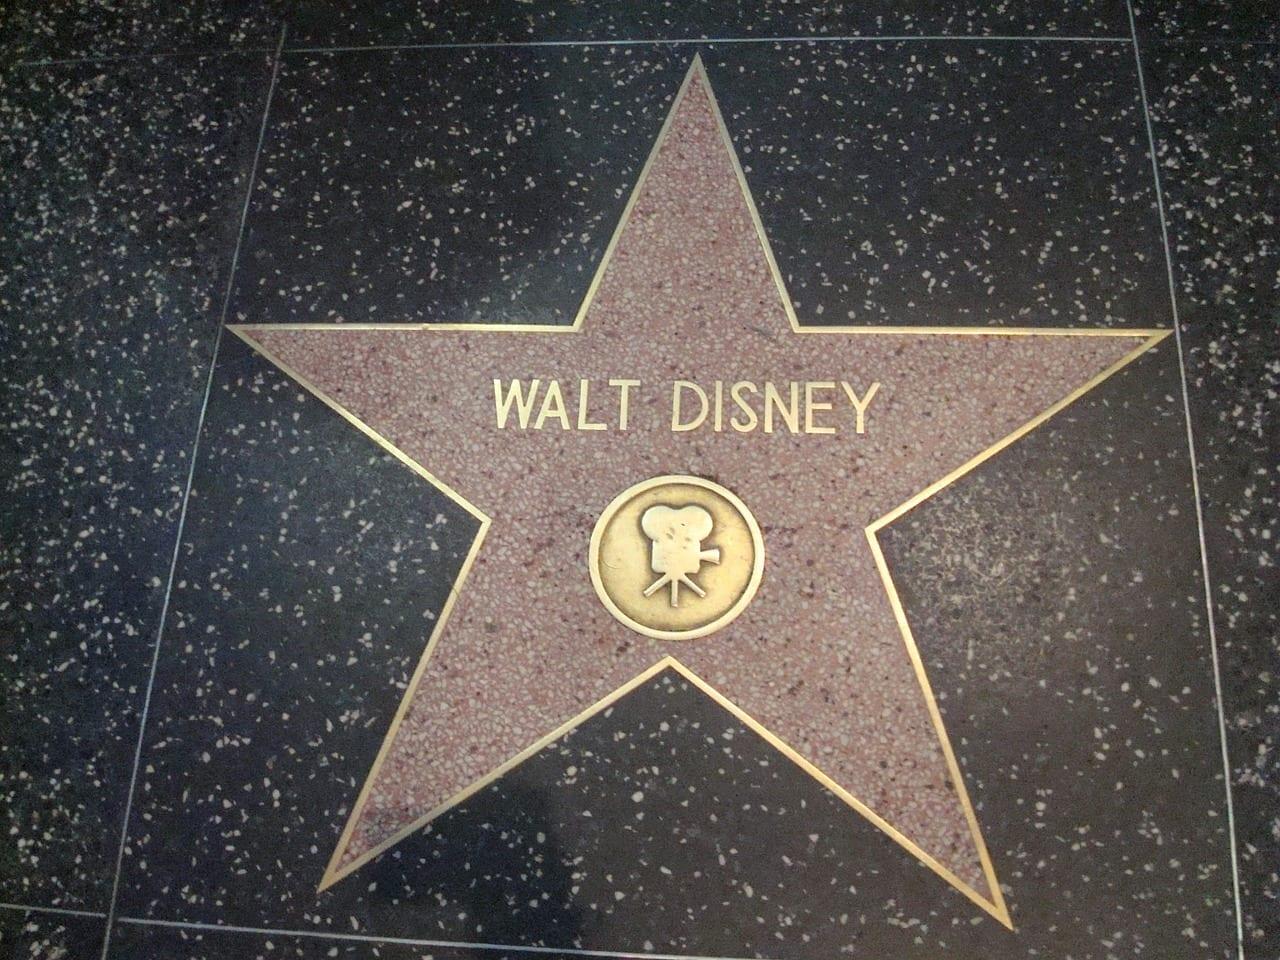 fun facts about Walt Disney